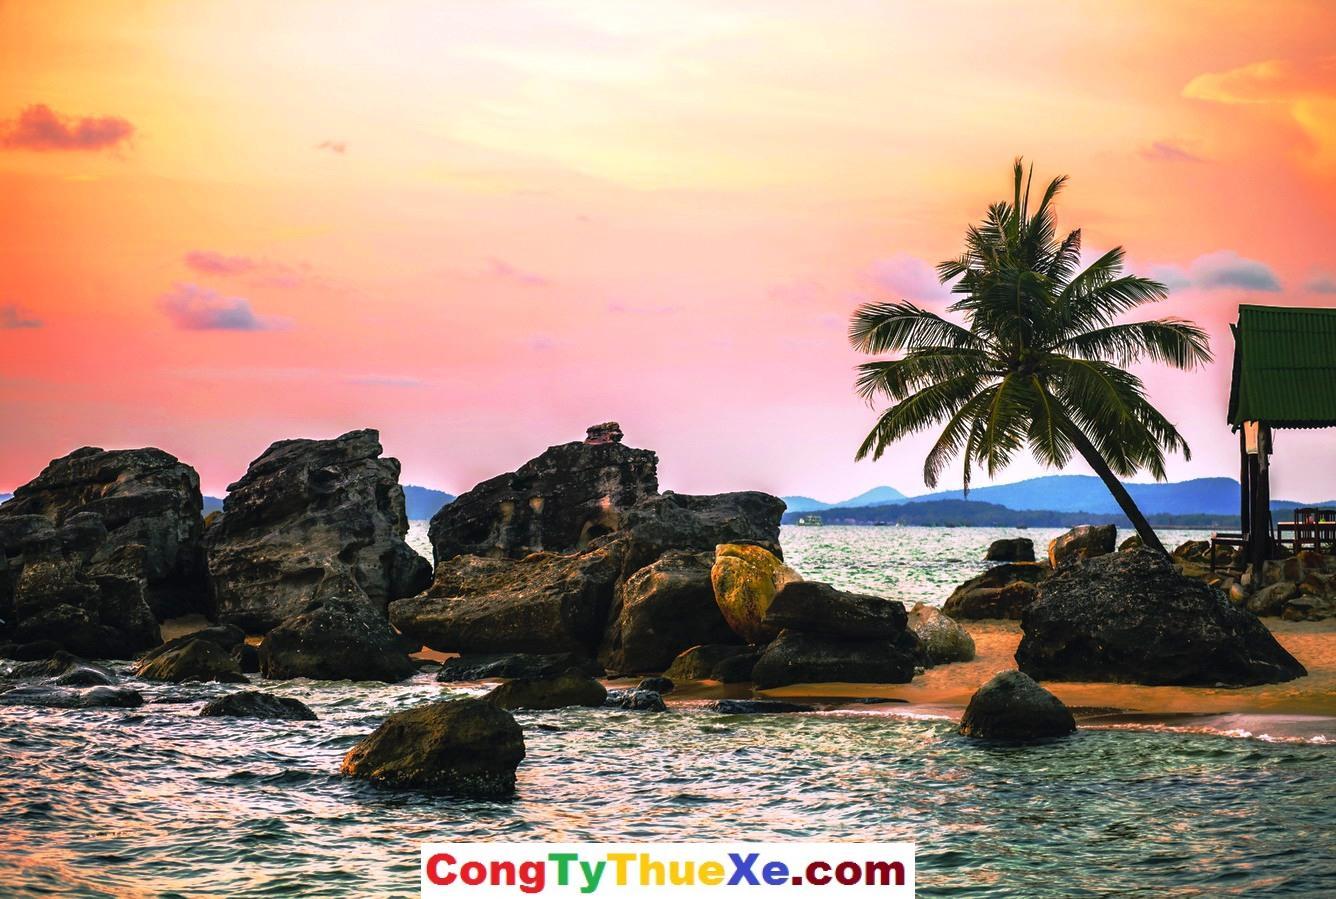 Beach at sunset at Phu Quoc island  in Vietnam